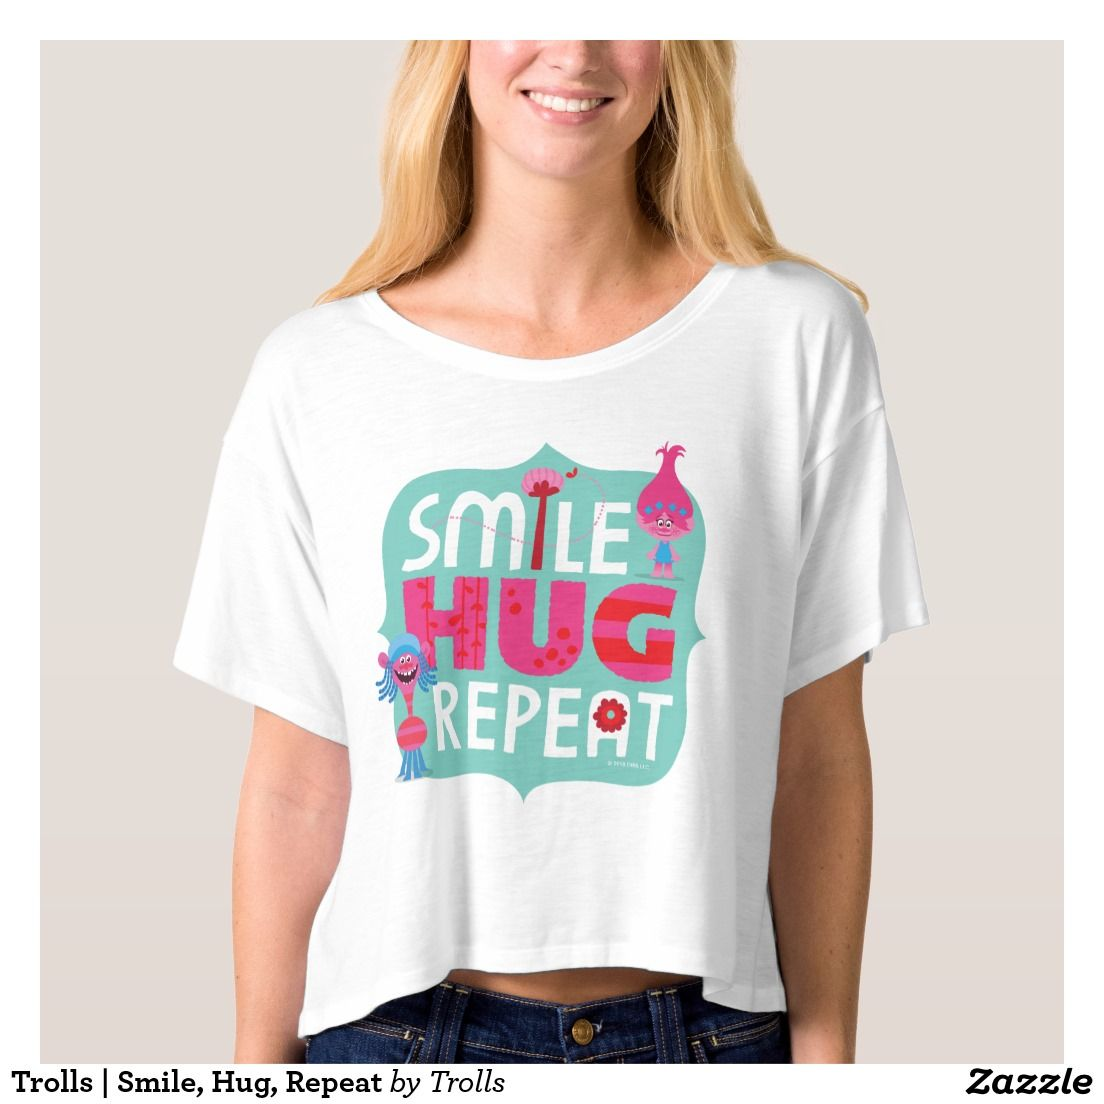 fdc17855 Trolls | Smile, Hug, Repeat T-shirt | Zazzle.com in 2019 | Trolls ...